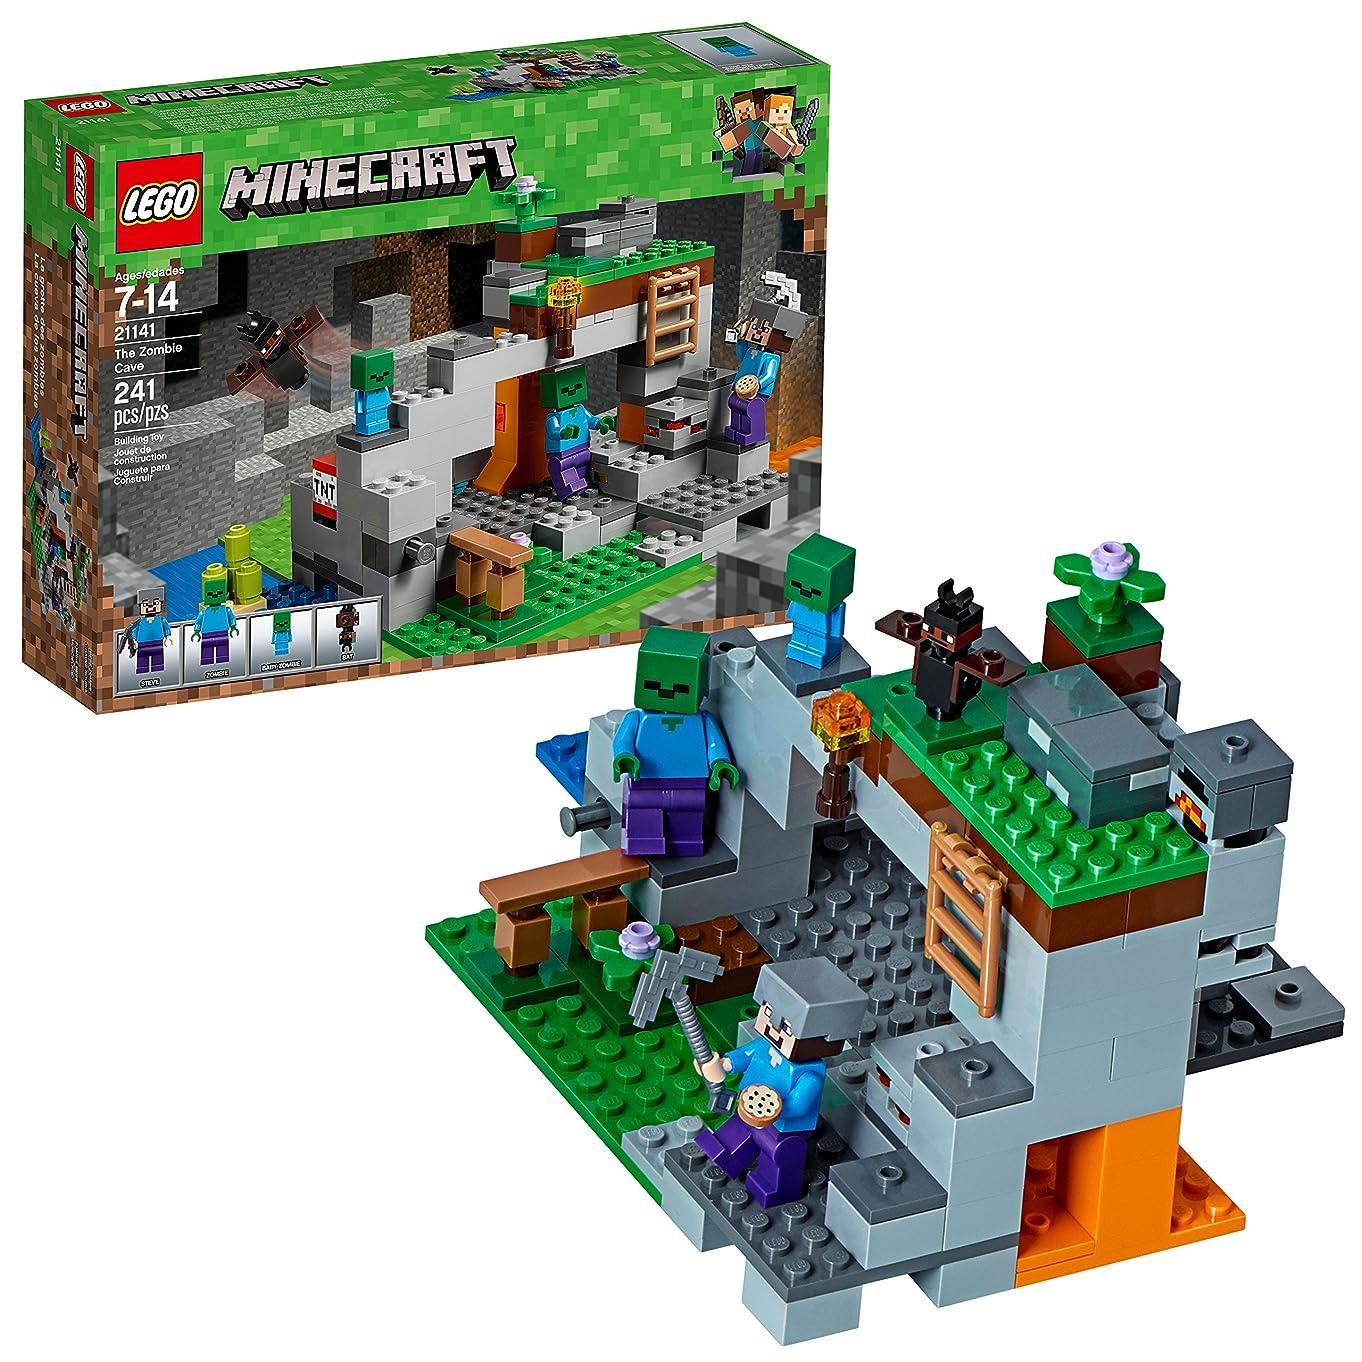 LEGO Minecraft The Zombie Cave 21141 Building Kit (241 Piece)